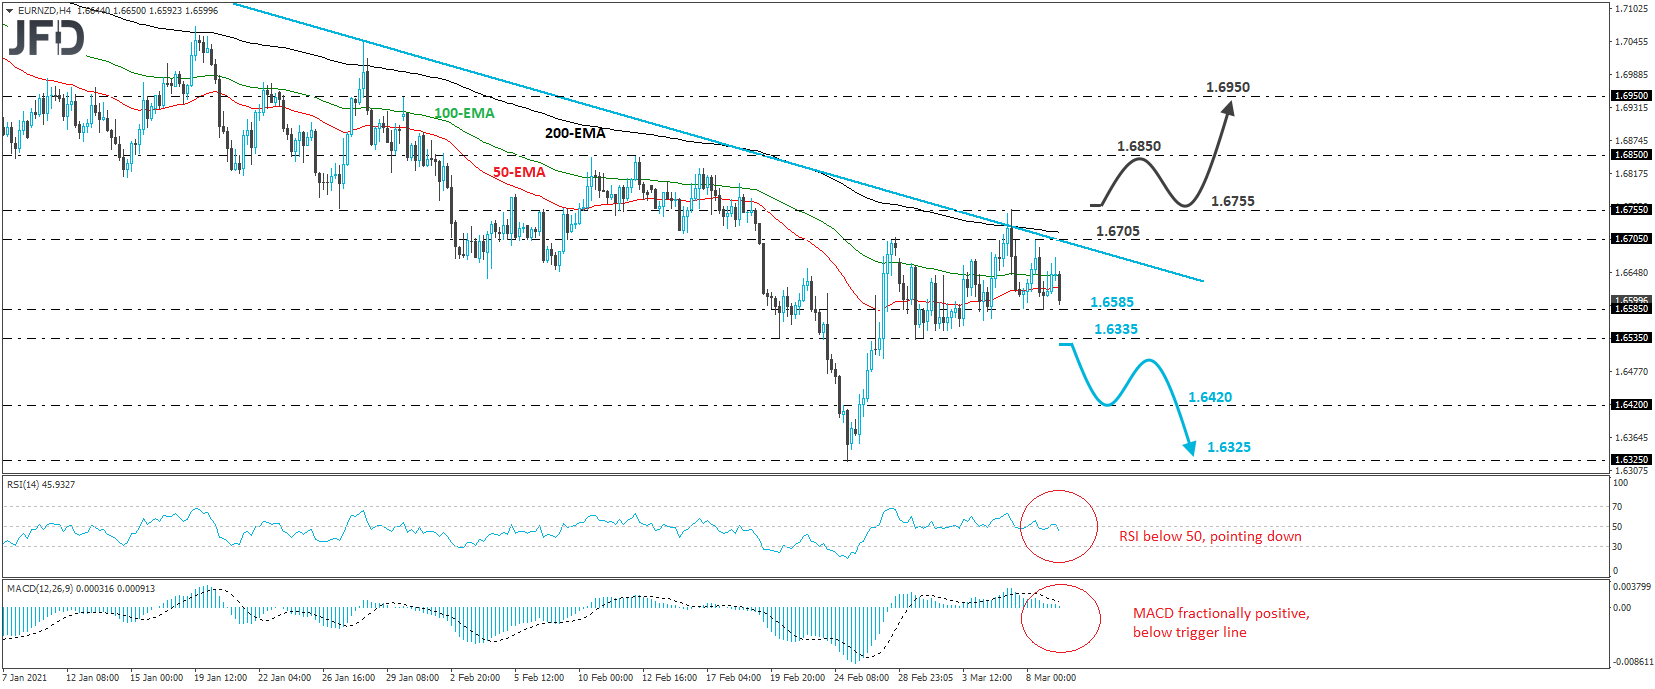 EUR/NZD 4-hour chart technical analysis